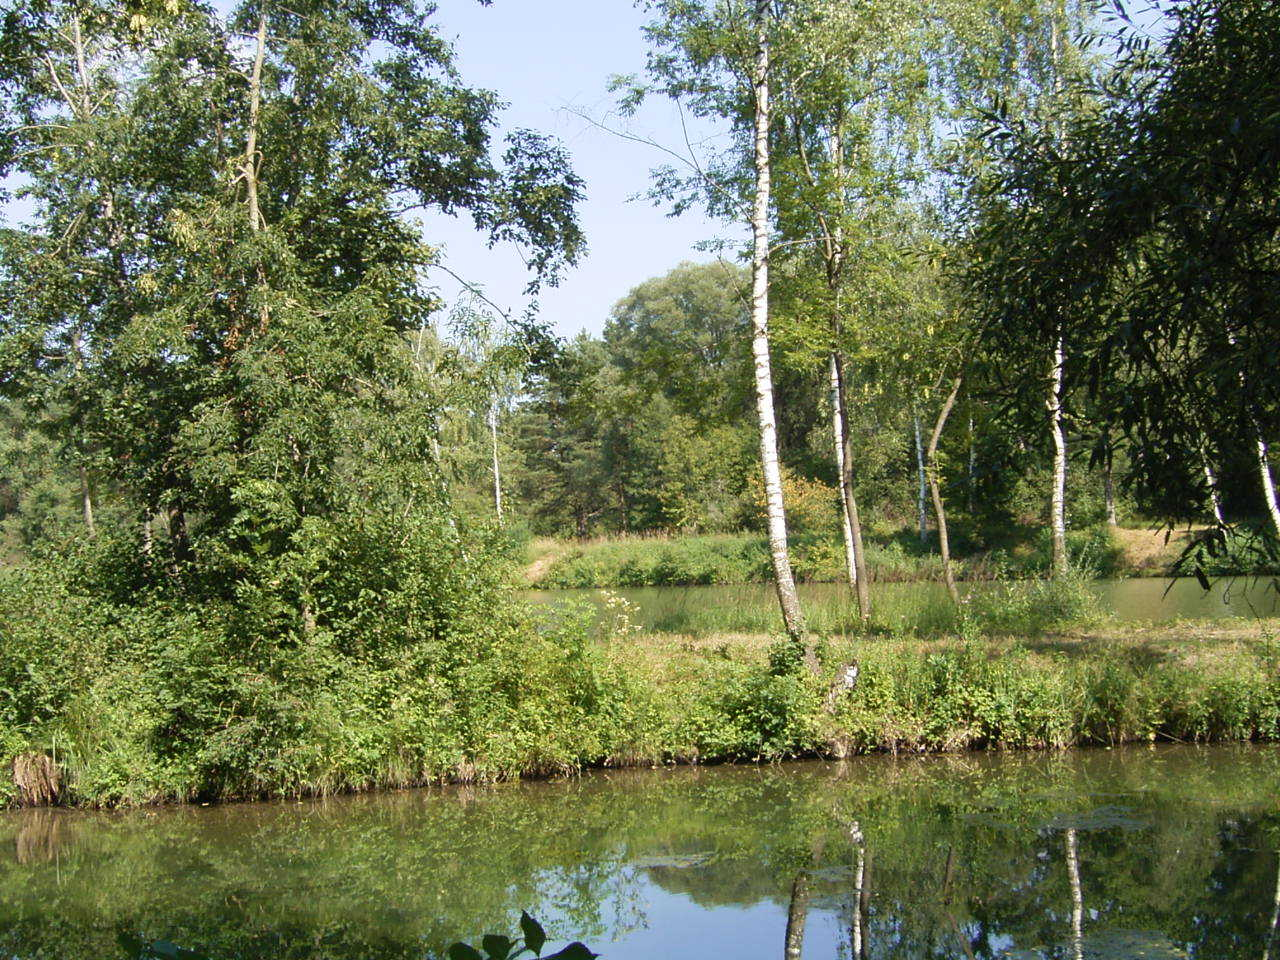 Naturschutzgebiet Reisensburg